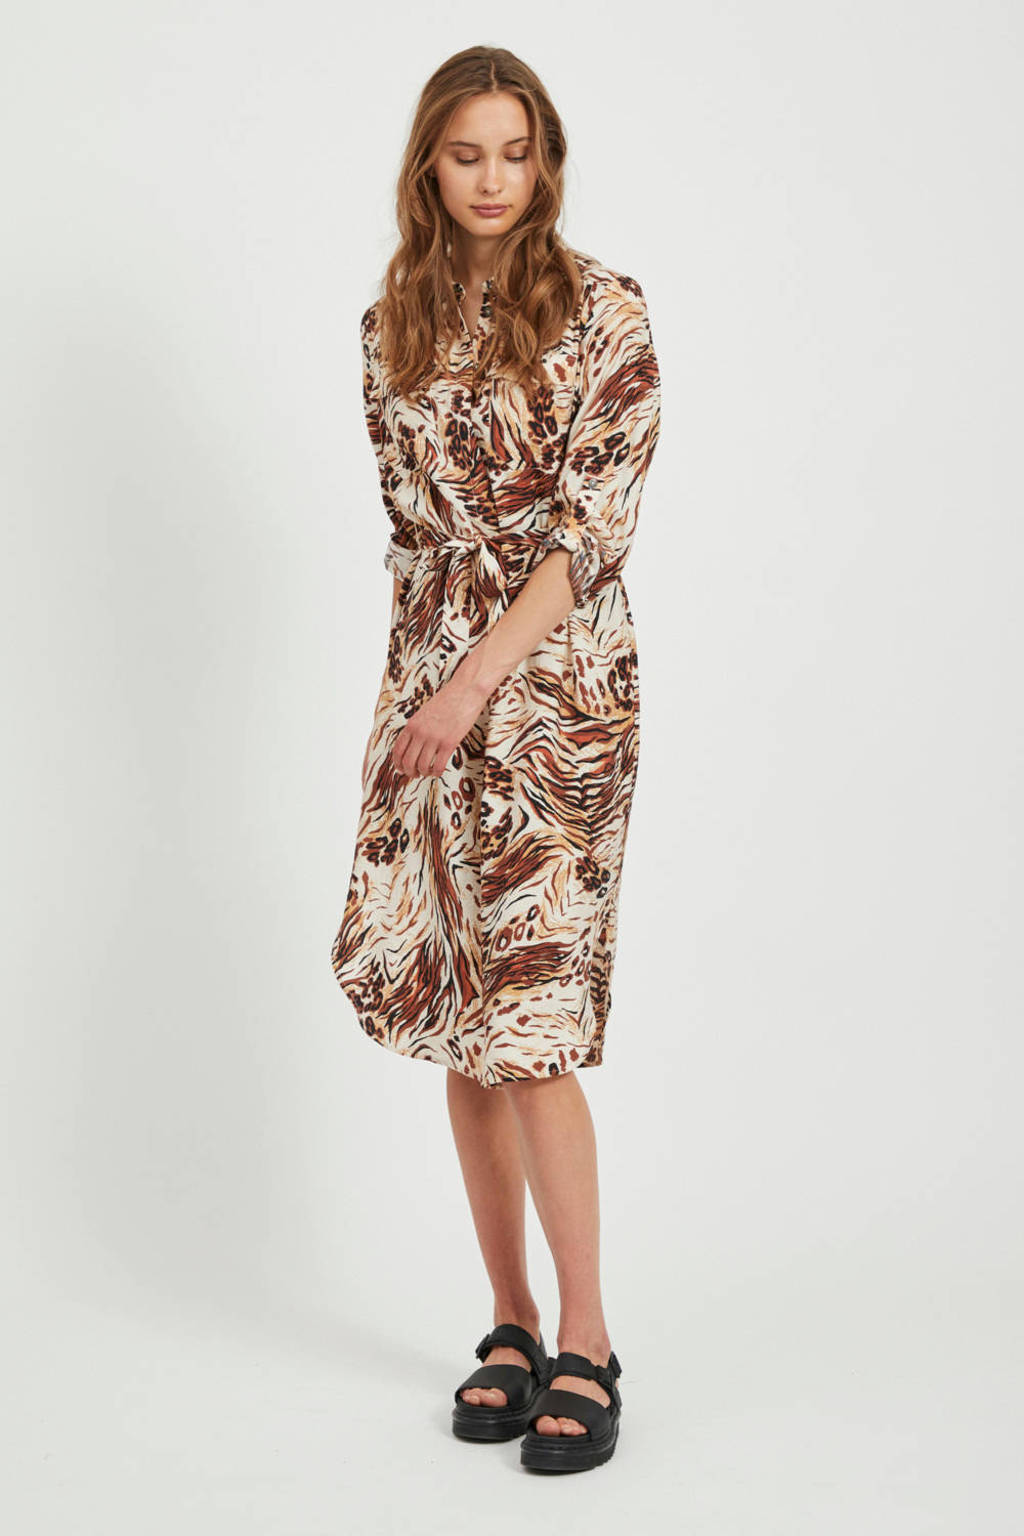 OBJECT blousejurk Emerson met all over print en ceintuur beige/bruin, Beige/bruin